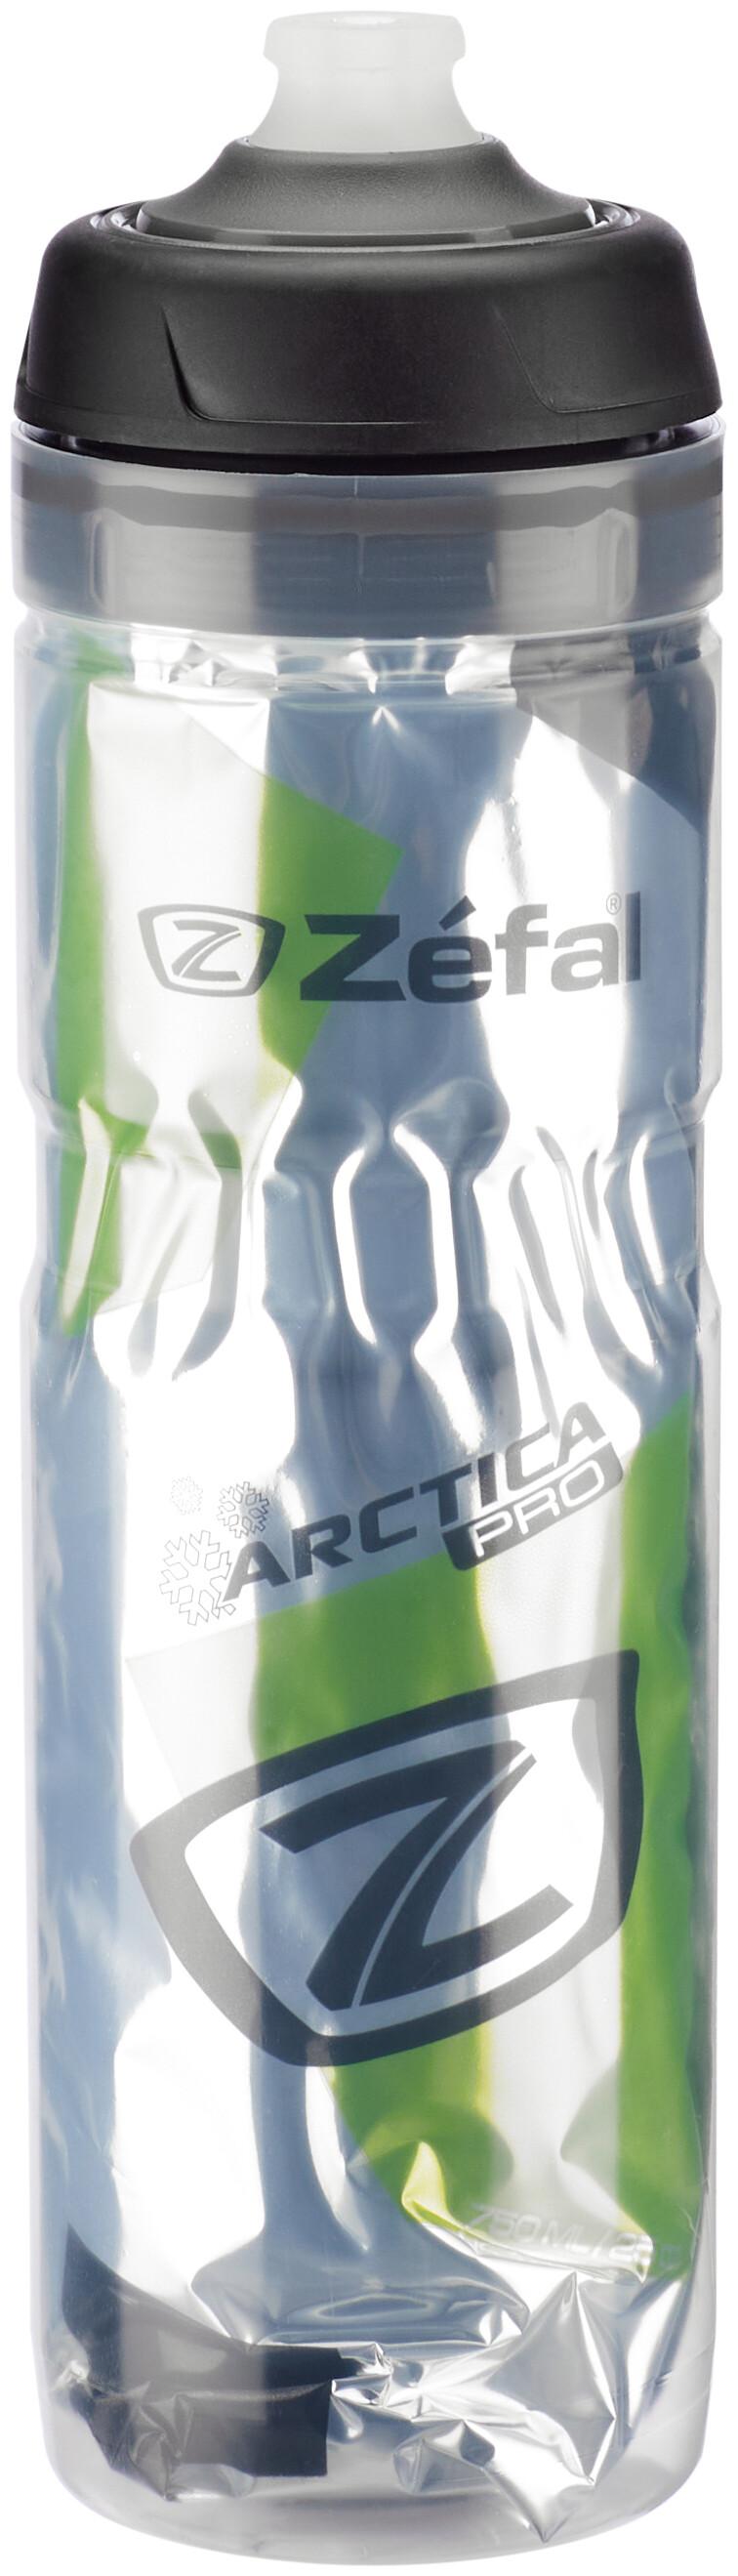 Zefal Thermoflasche Arctica Pro 750 ml grün Fahrrad